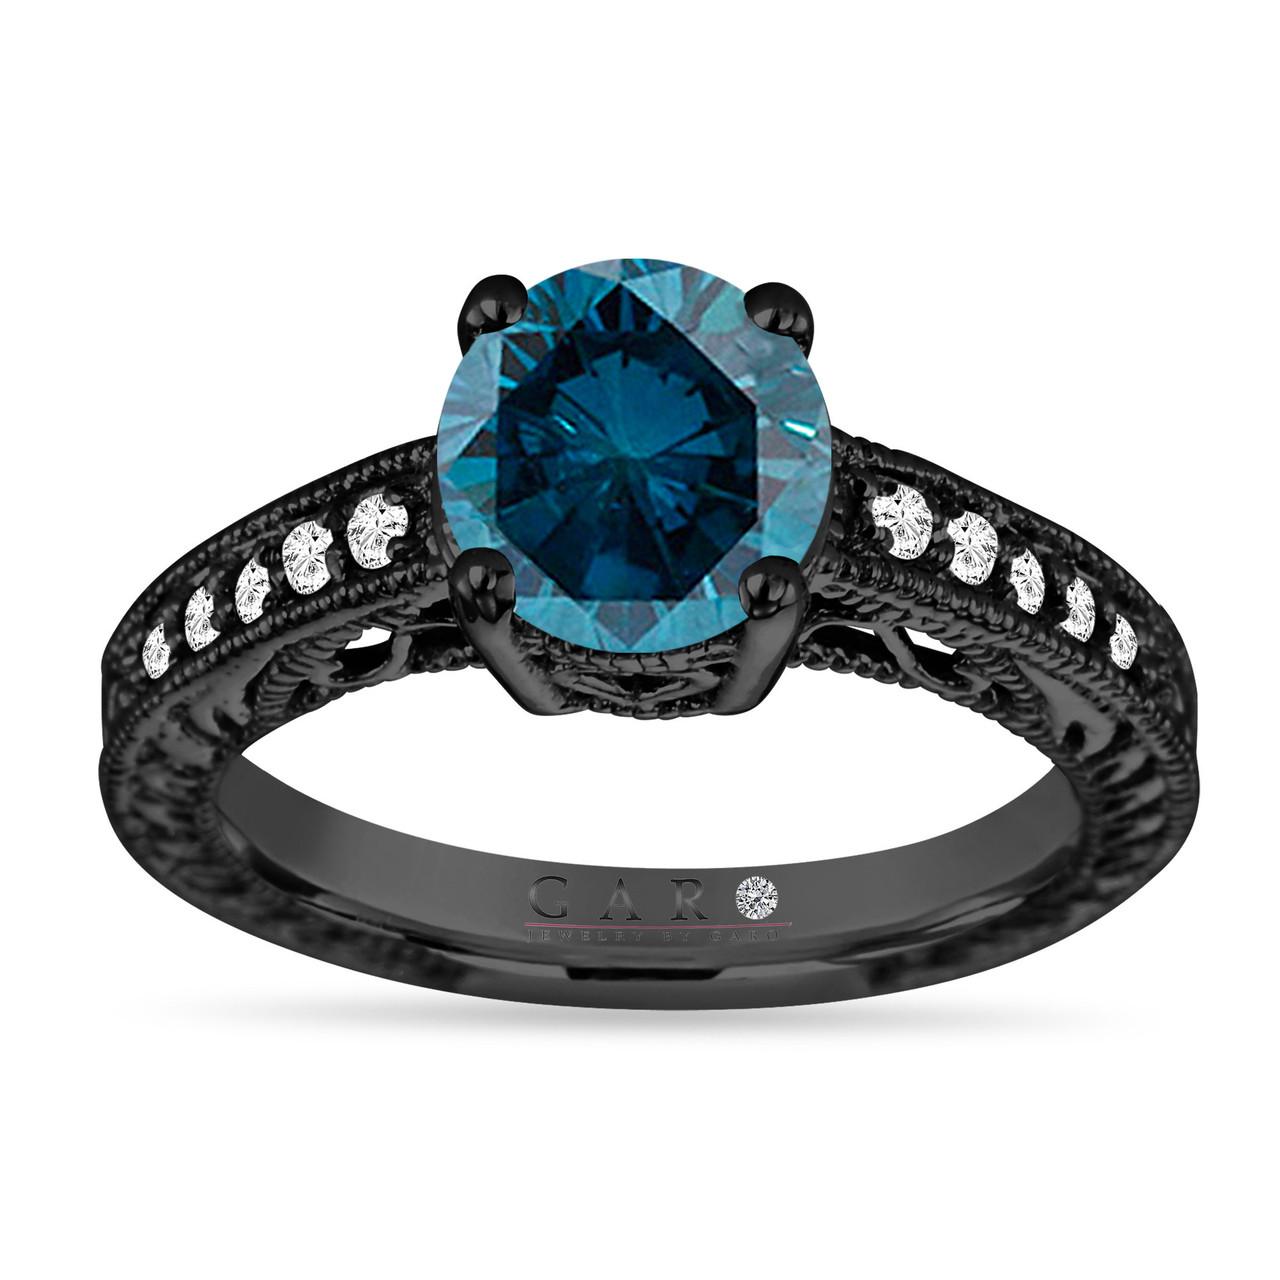 2 20 Carat Blue Diamond Engagement Ring Unique Vintage Style 14k Black Gold Certified Handmade